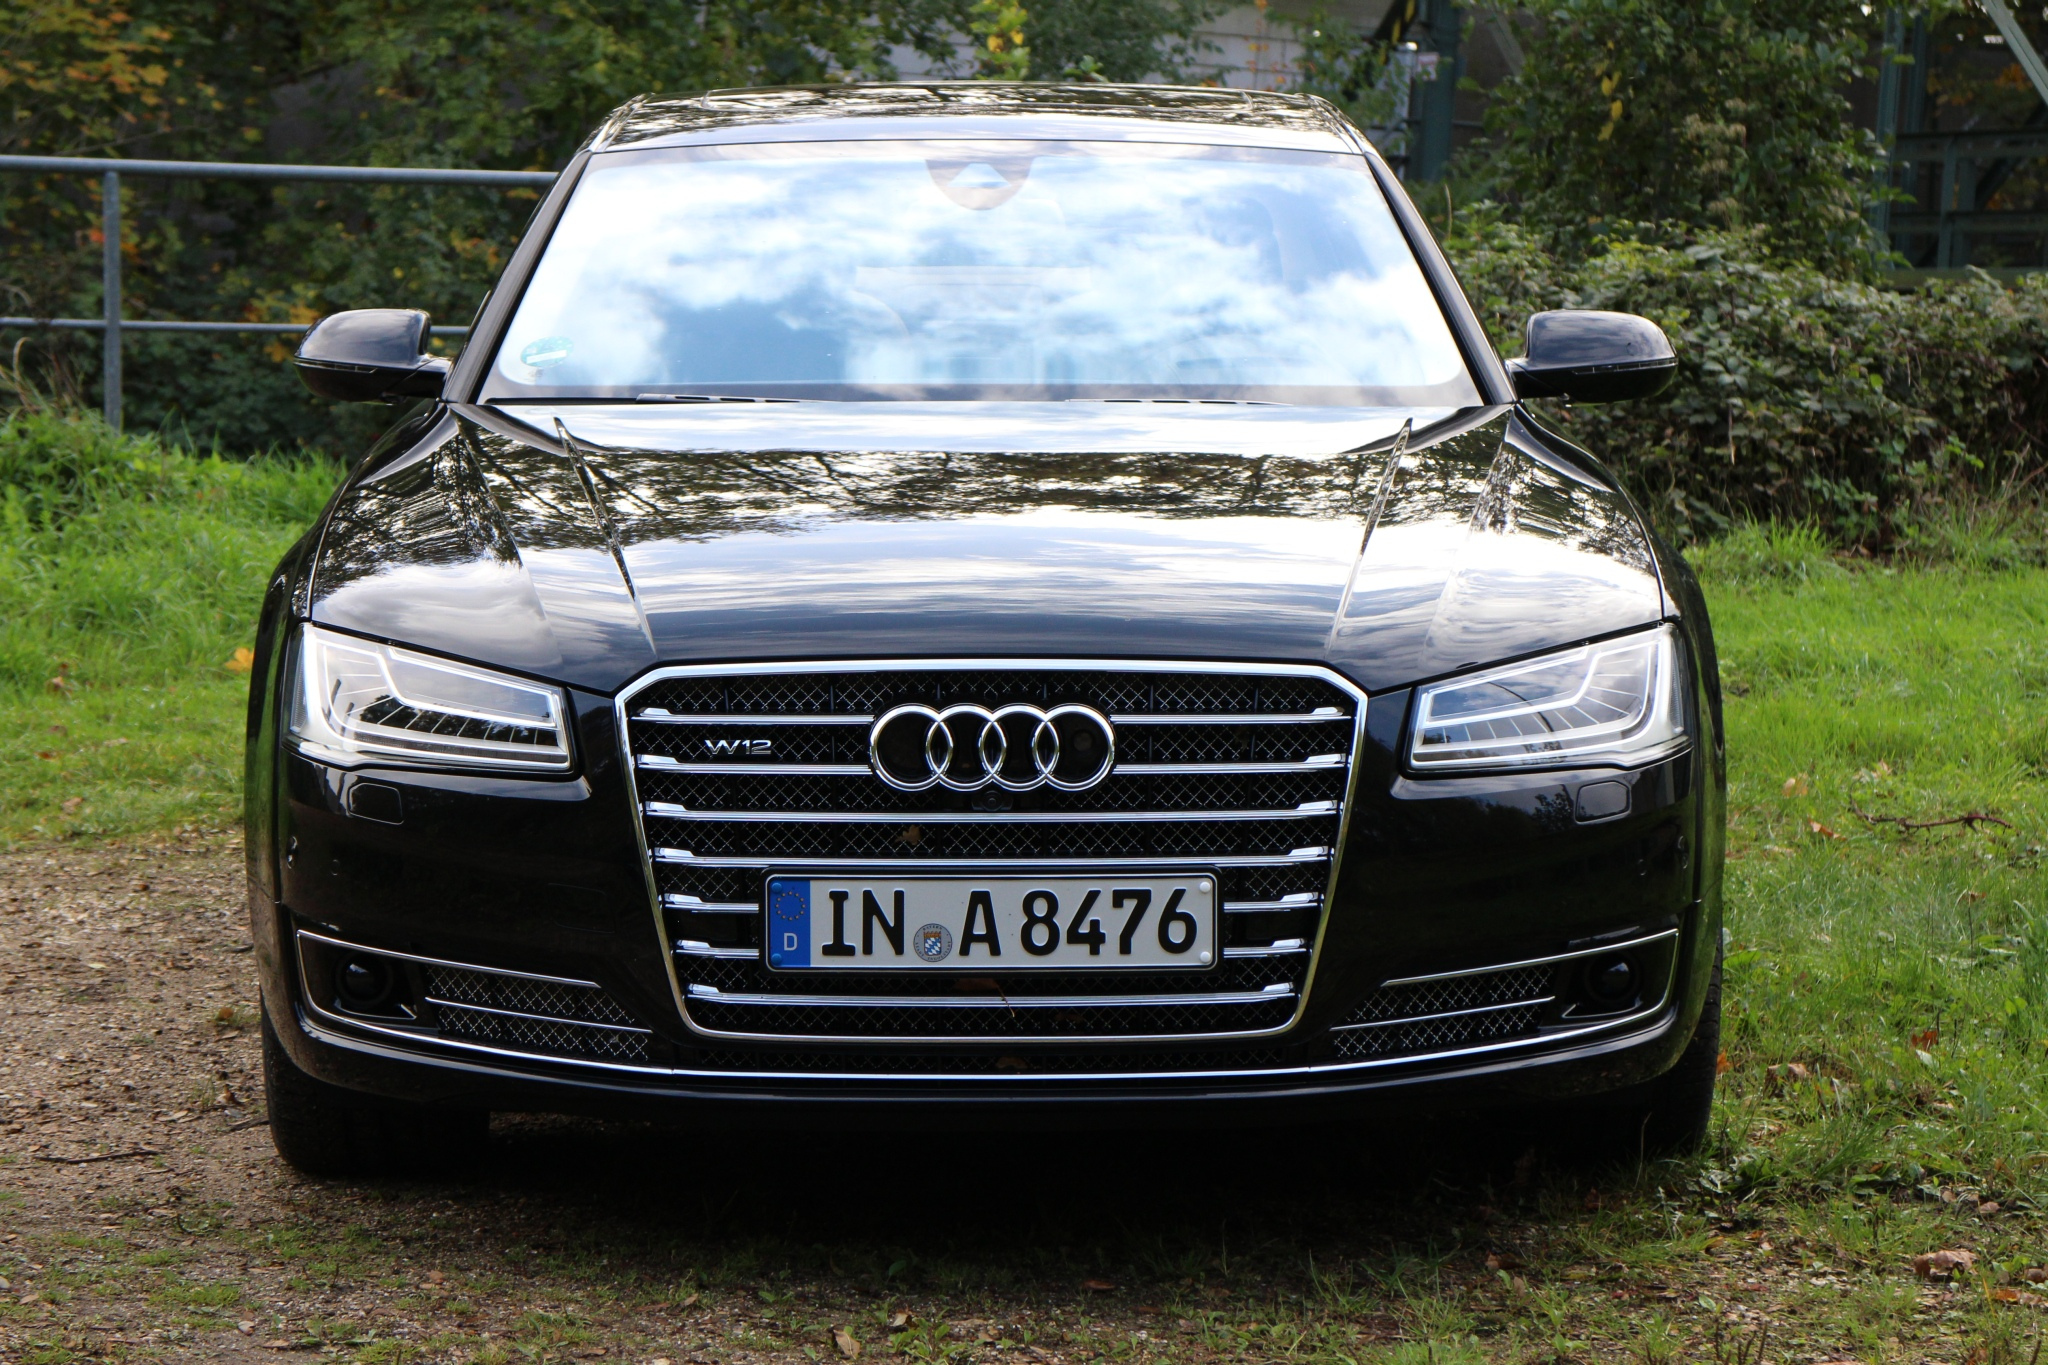 File:Audi A8 2013 (11209789925).jpg - Wikimedia Commons on 2005 audi a8 w12, audi r8 w12, 2010 audi a8 l, 2004 audi a8 w12, 2007 audi a8 w12, 2010 audi a8l w12, 2008 audi a8 w12,